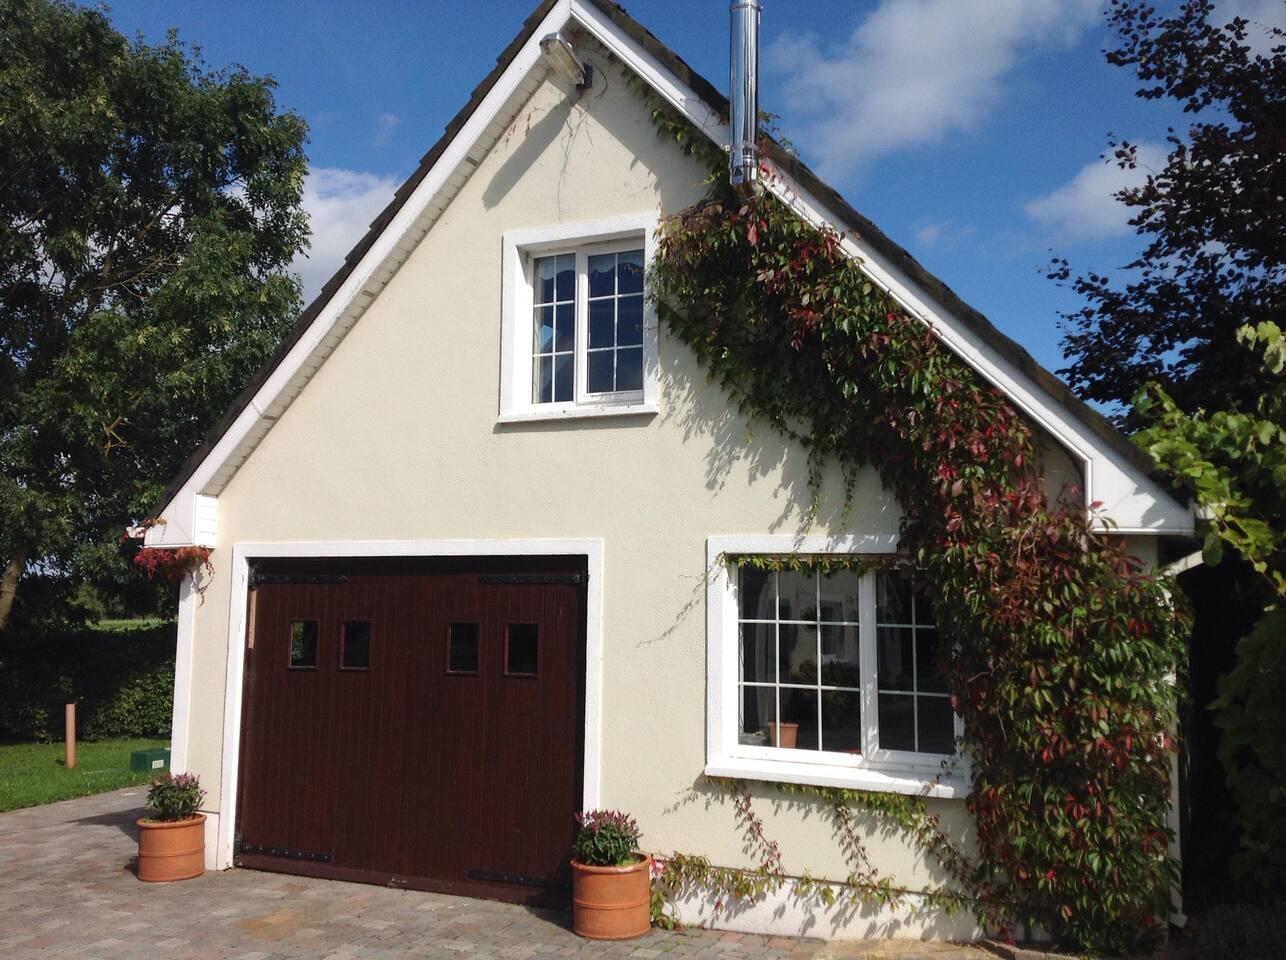 Outside, entrance at side